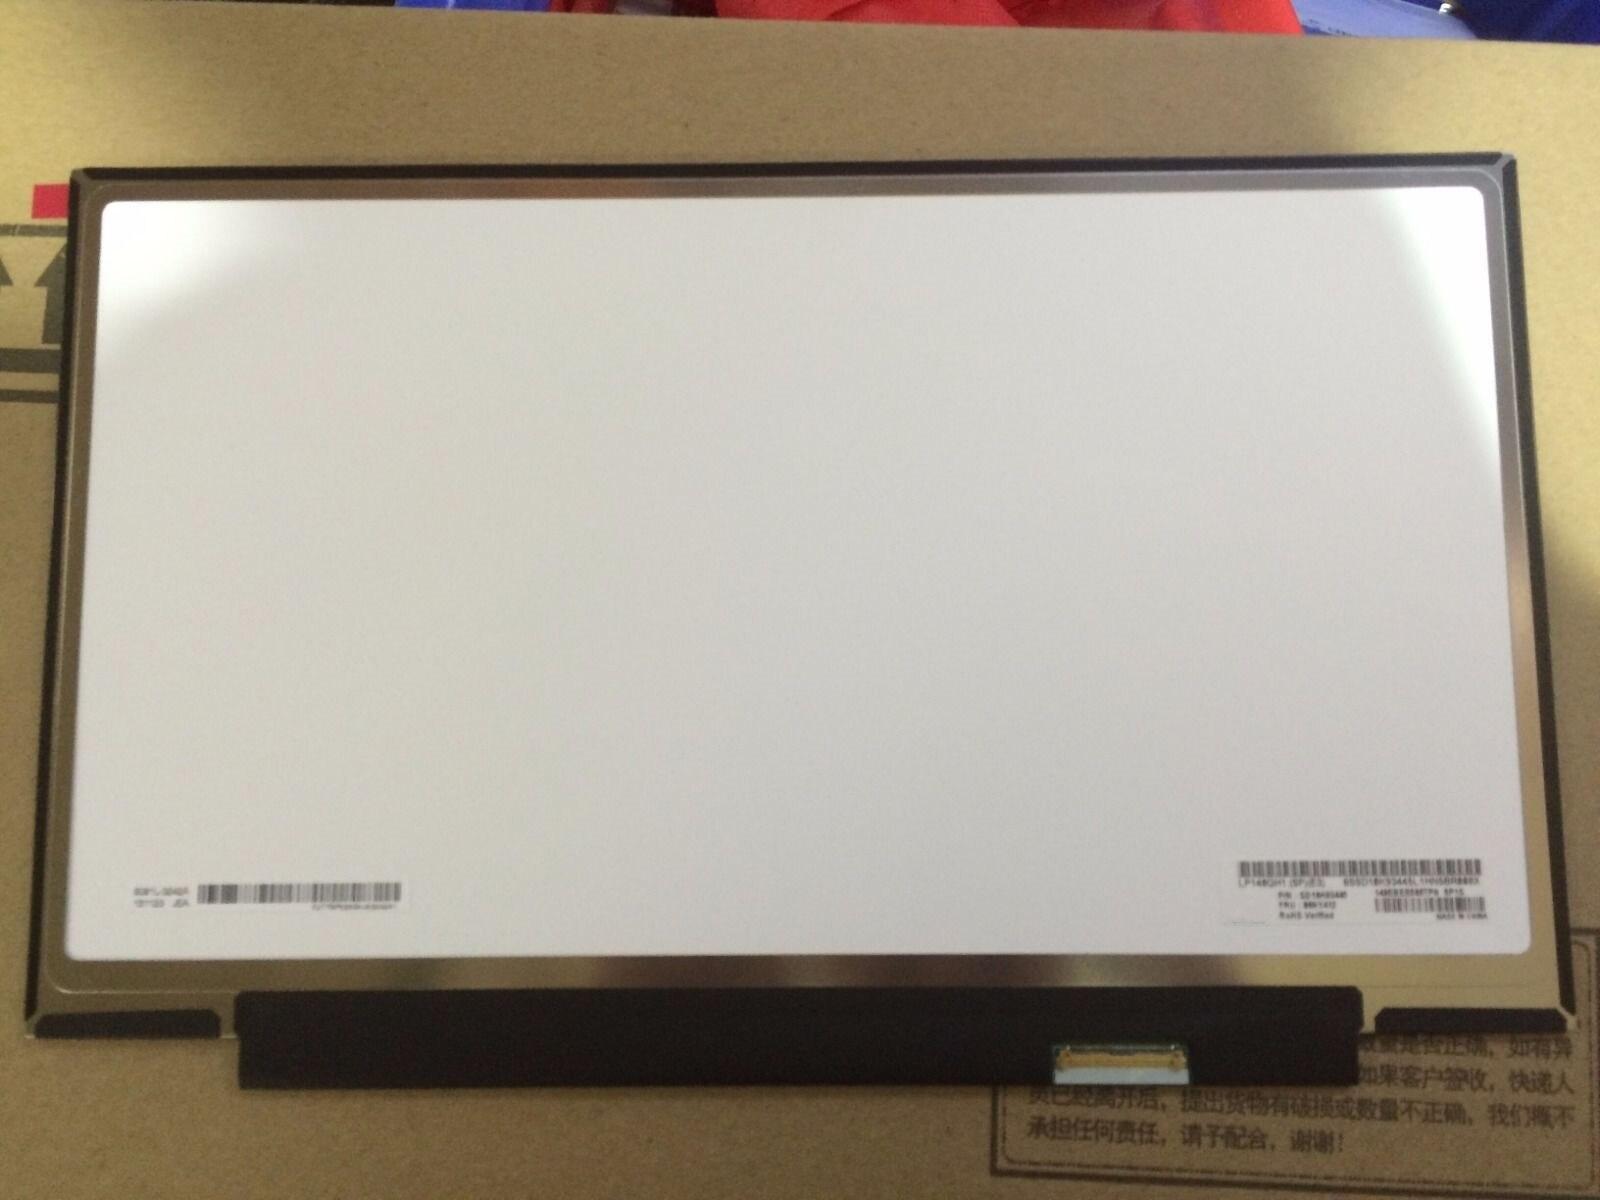 14.0LED LCD Screen Display LP140QH1-SPE3 SP E3 2560x1440 QHD edp30pin IPS original 1920x1080 laptop 15 6 full hd lcd screen b156han01 2 led display edp30pin matte screen finish